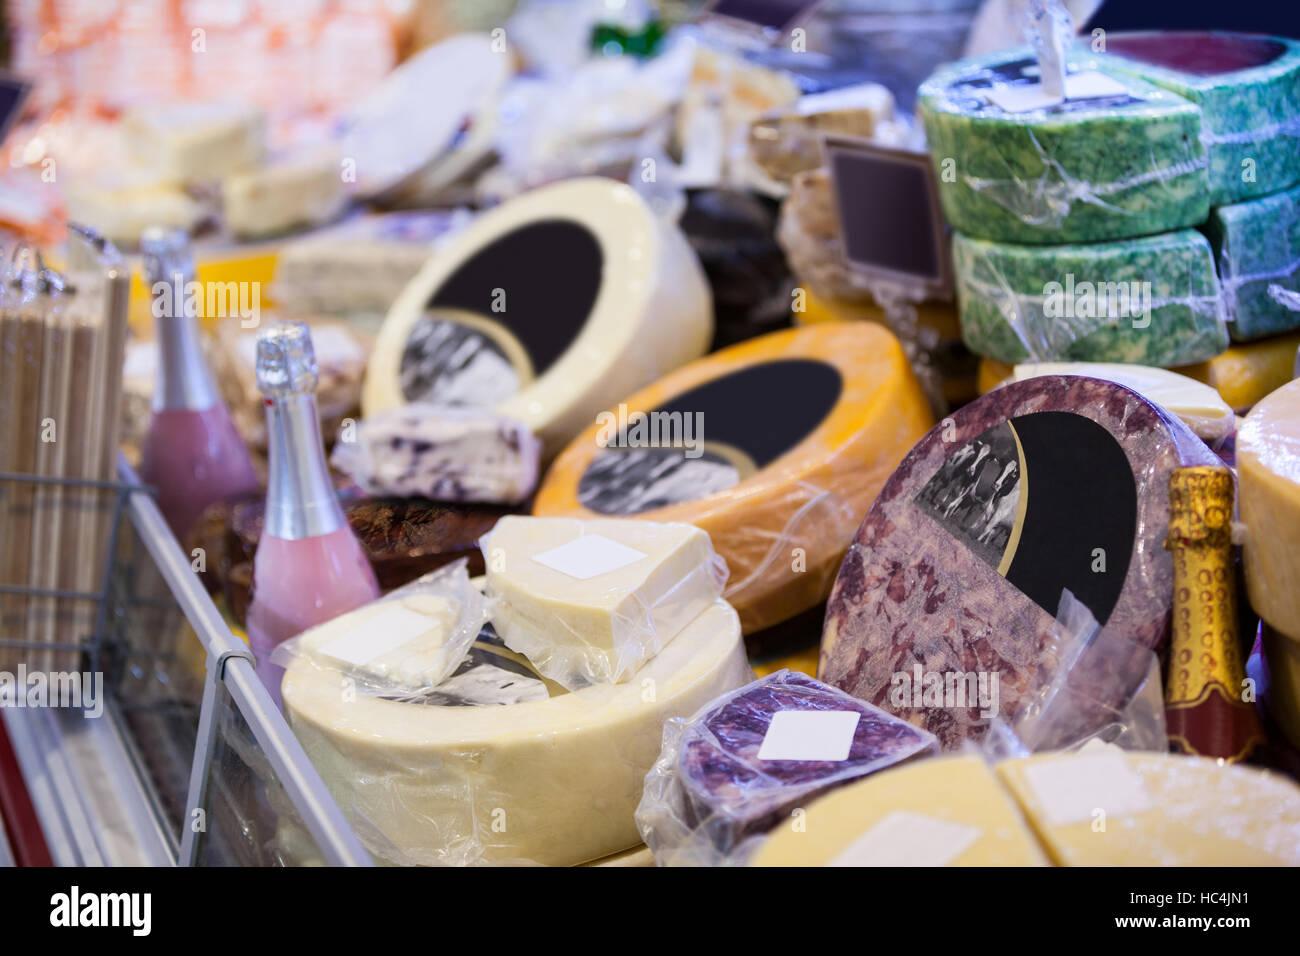 Variation of dessert in supermarket - Stock Image